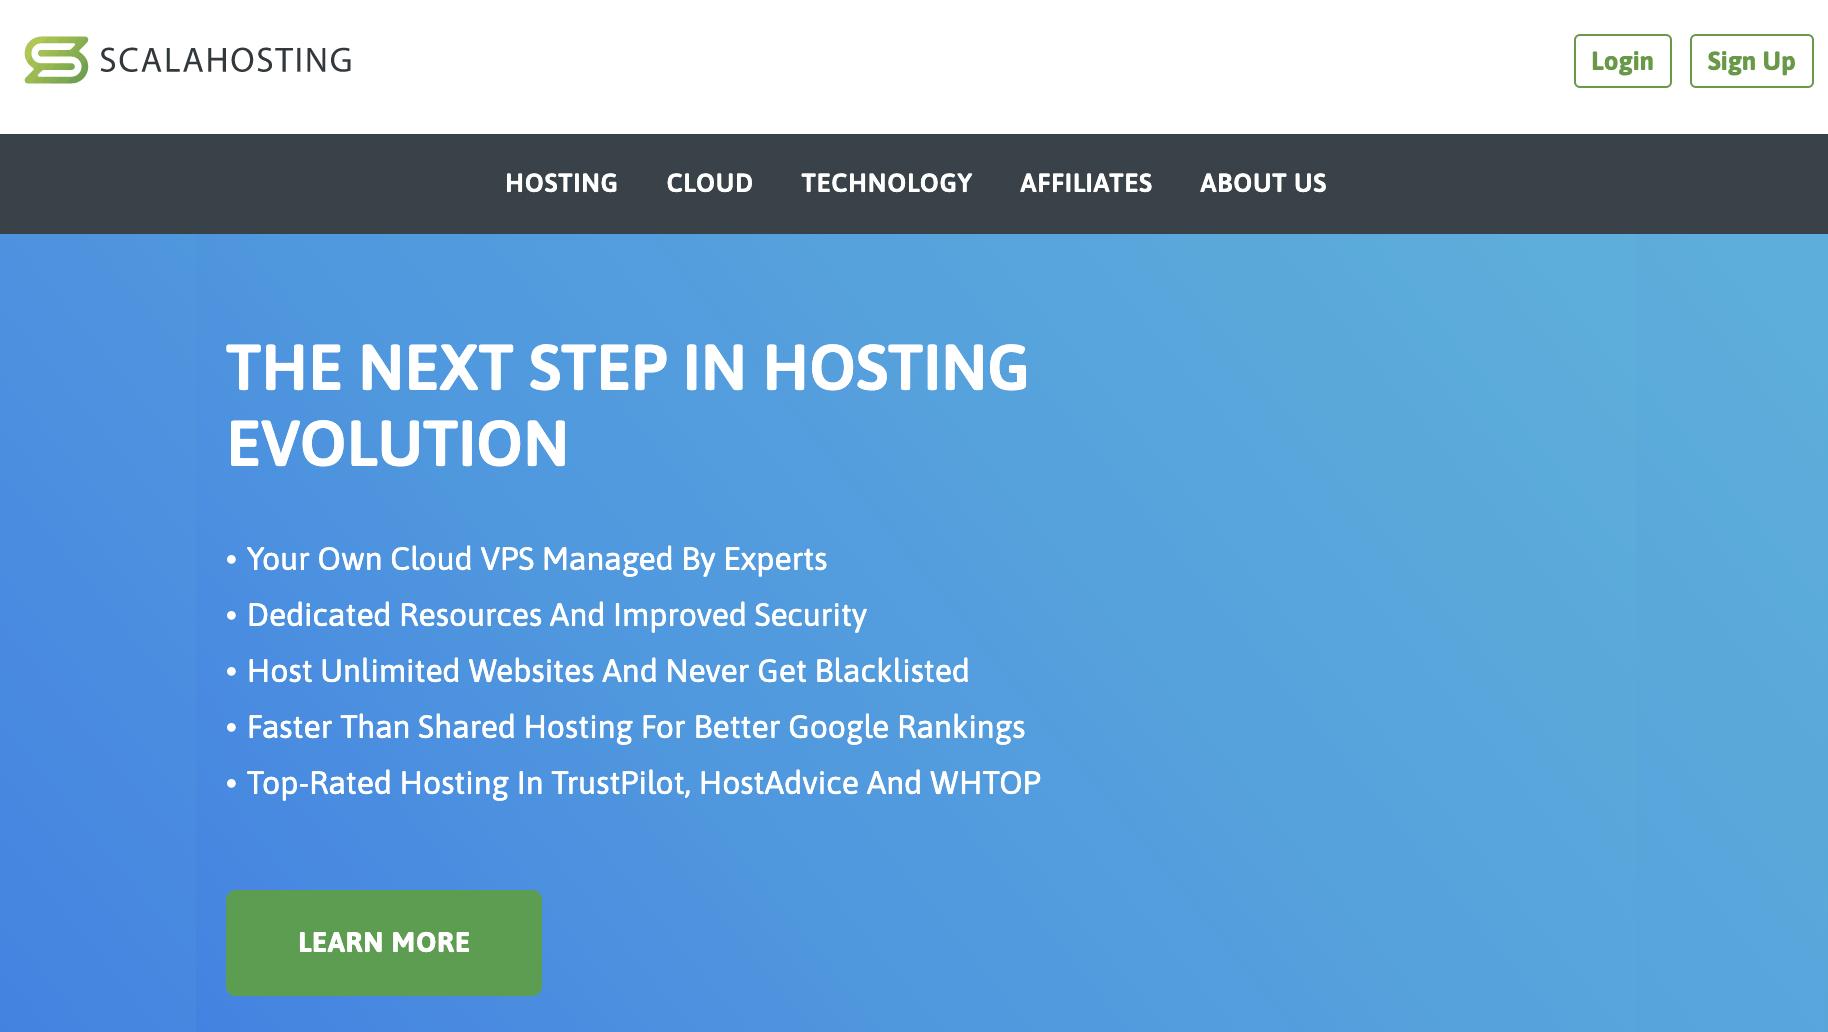 Scala Hosting Cloud VPS